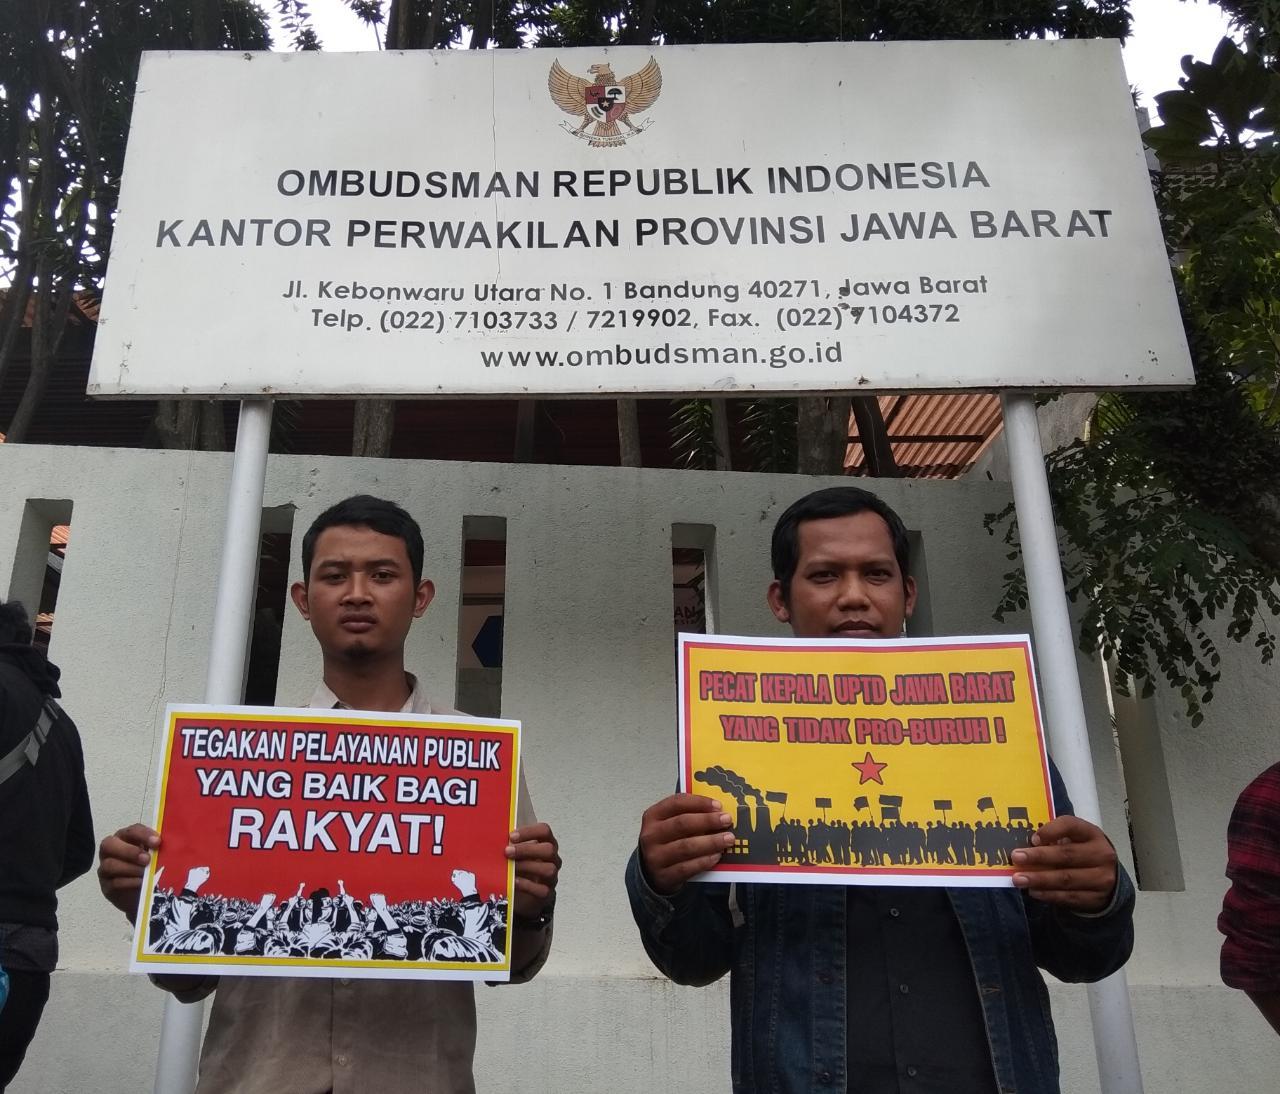 Pegawai Pengawas Ketenagakerjaan Diduga Lakukan Malpraktik, Fsedar Laporkan Ke Ombudsman